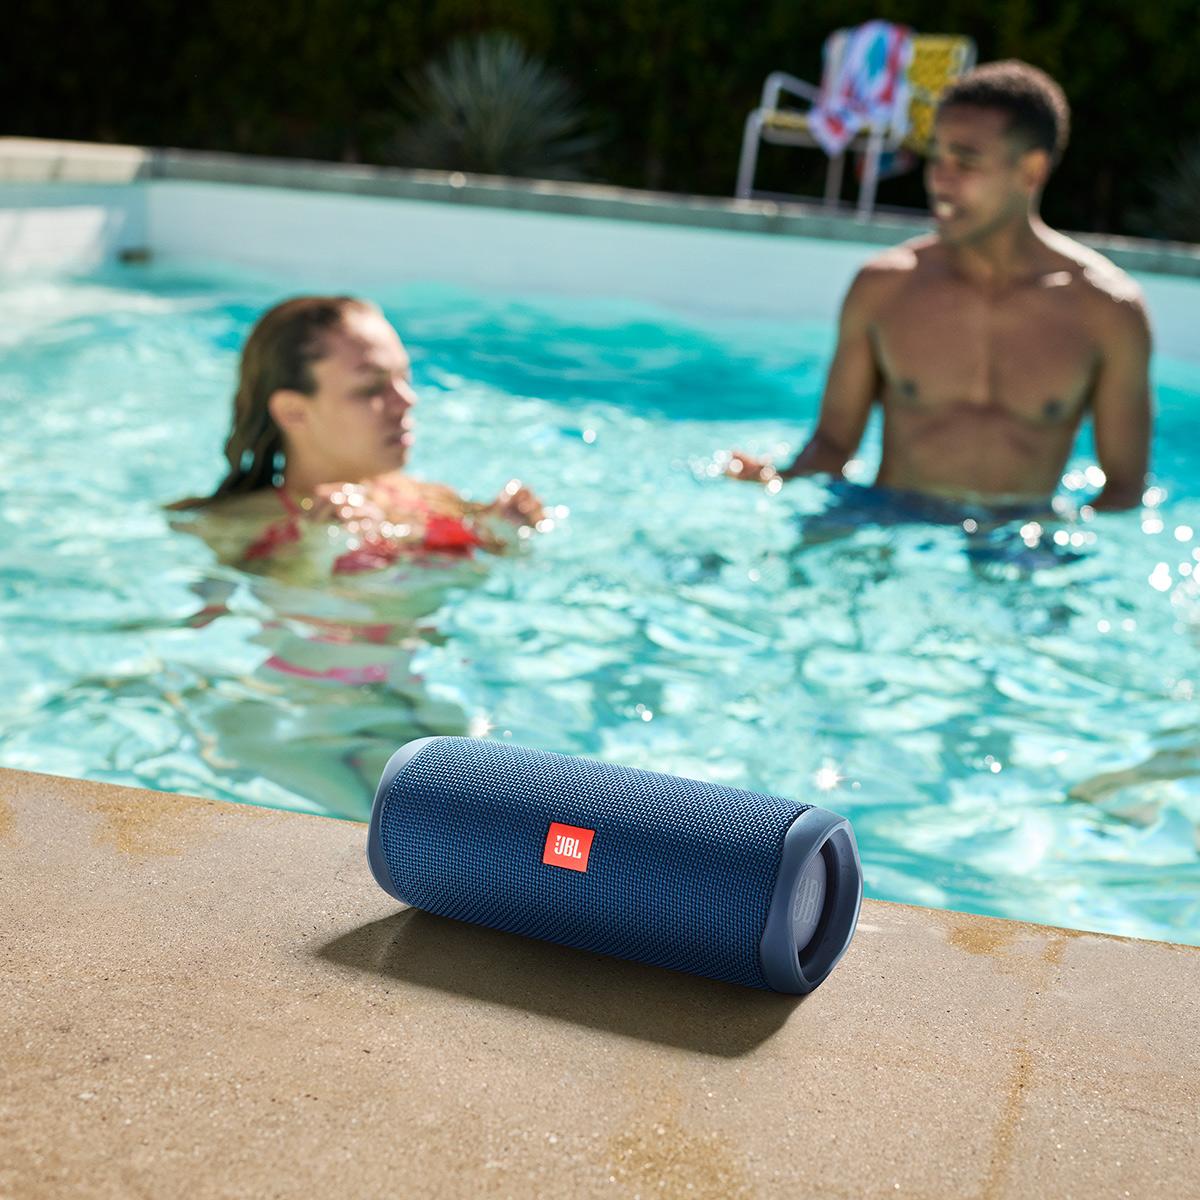 JBL-Flip-5-Portable-Waterproof-Bluetooth-Speaker thumbnail 11